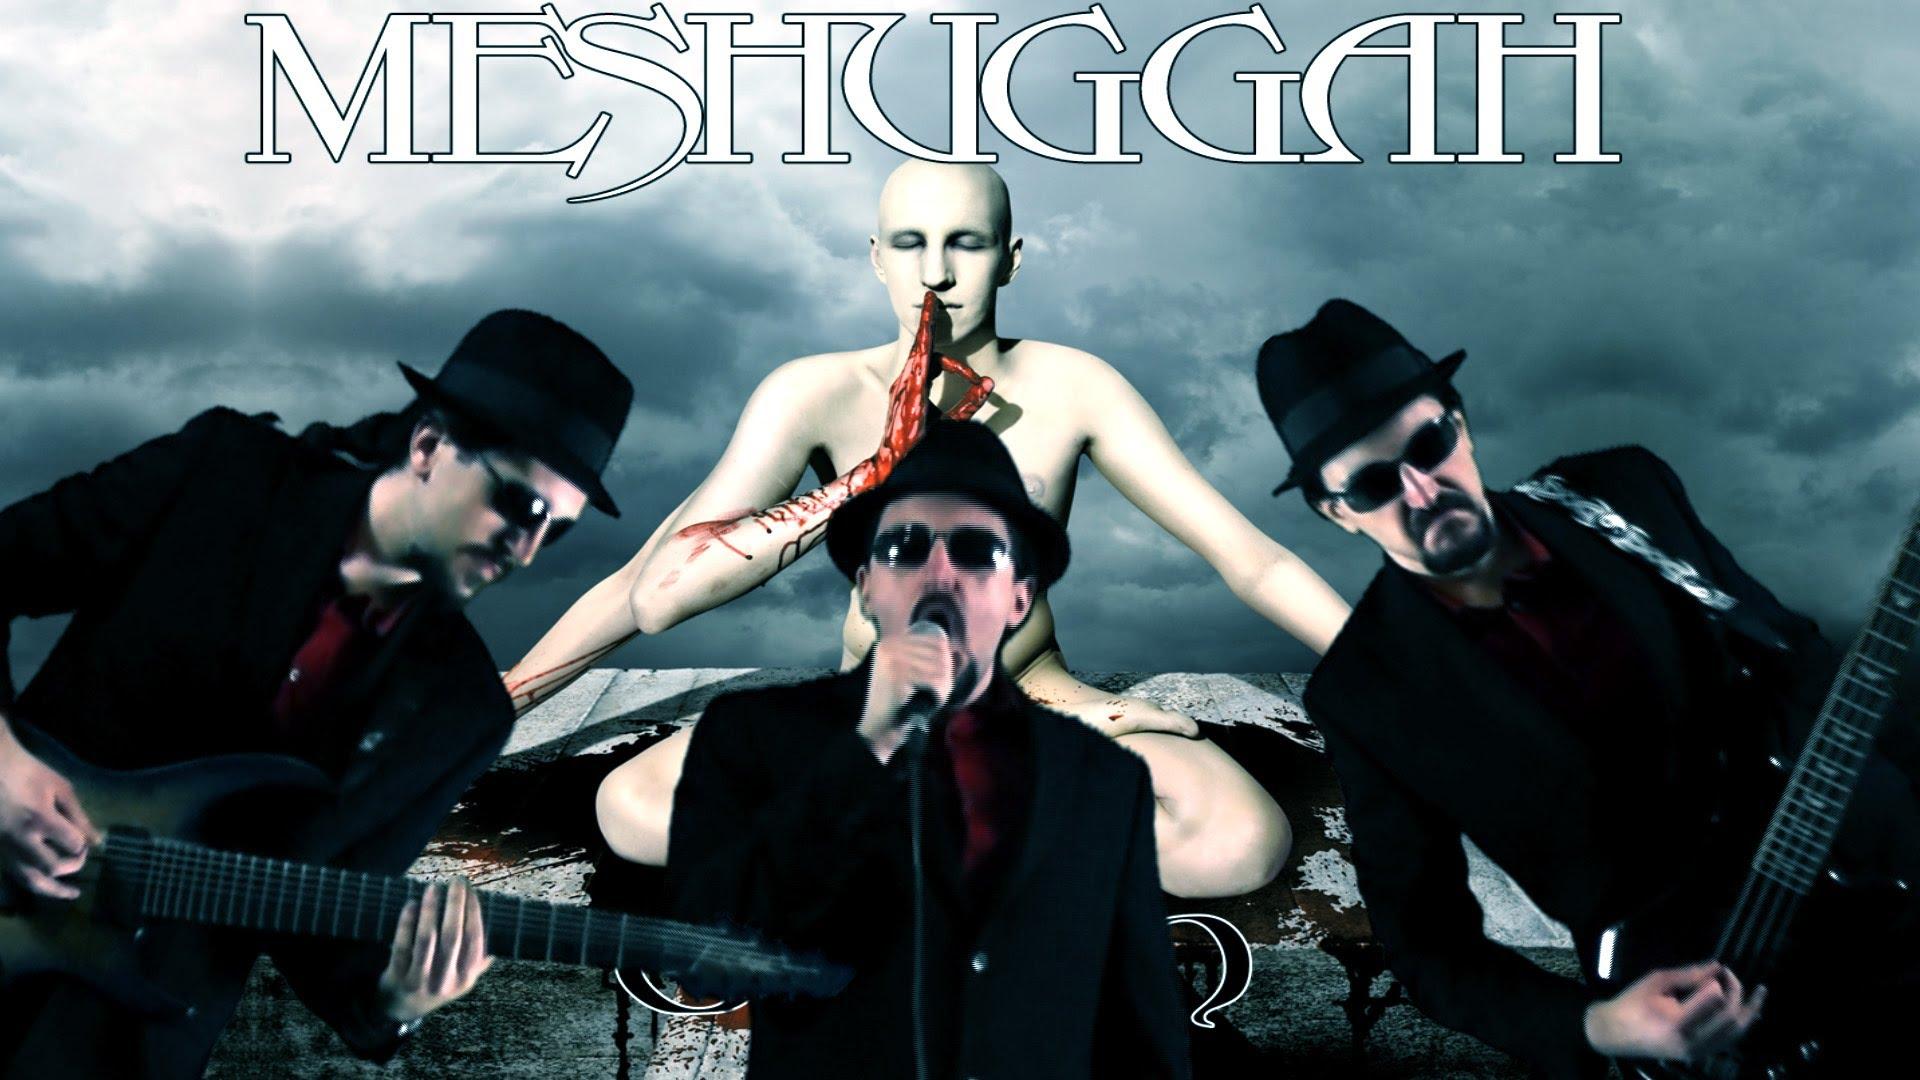 Meshuggah Wallpaper Maxresdefaultjpg 1920x1080